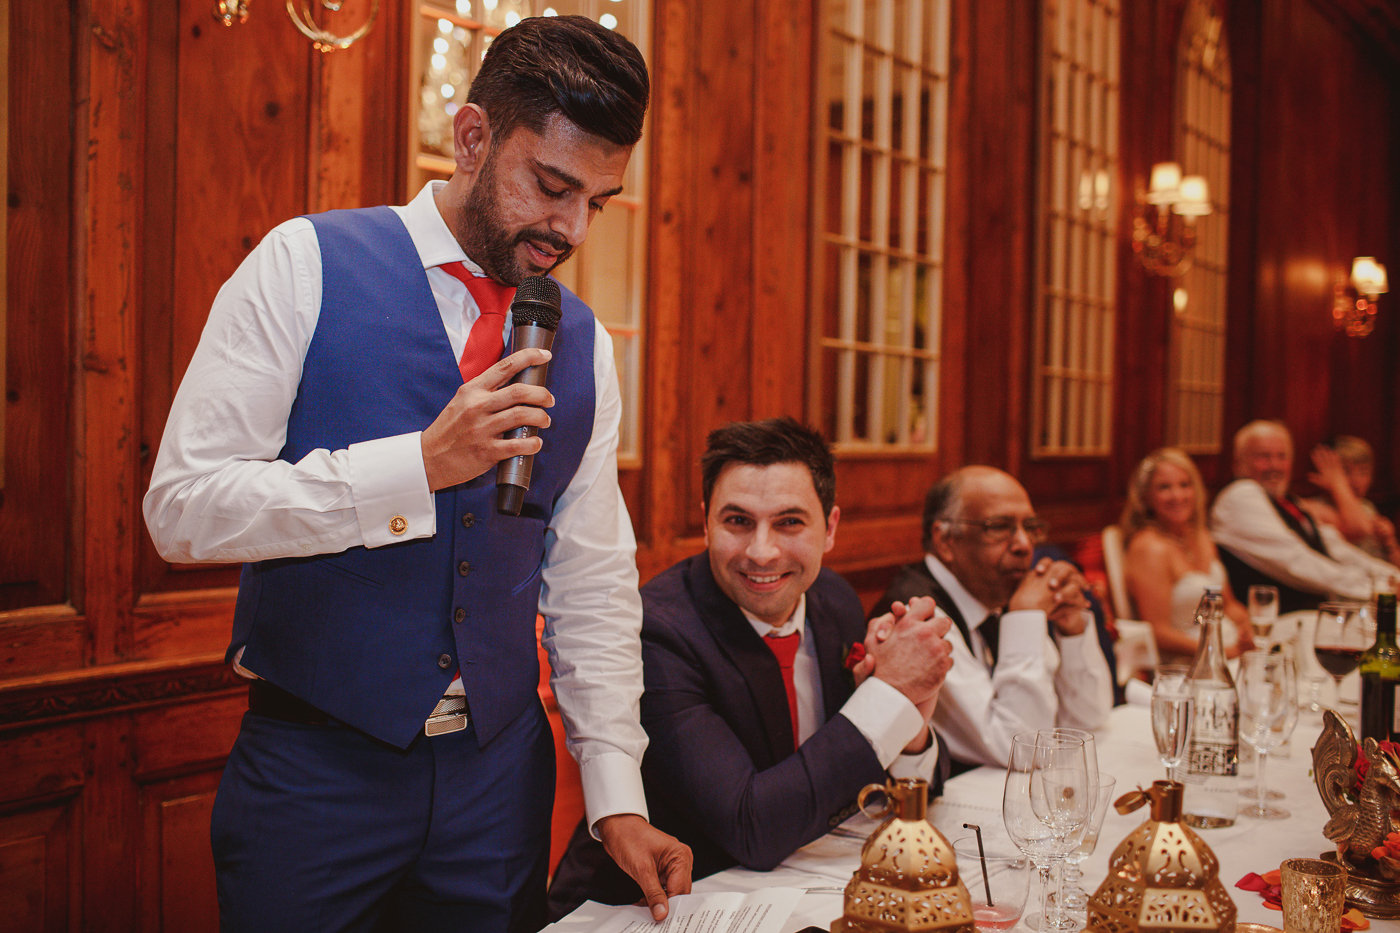 hedsor-house-wedding-photography-31.jpg